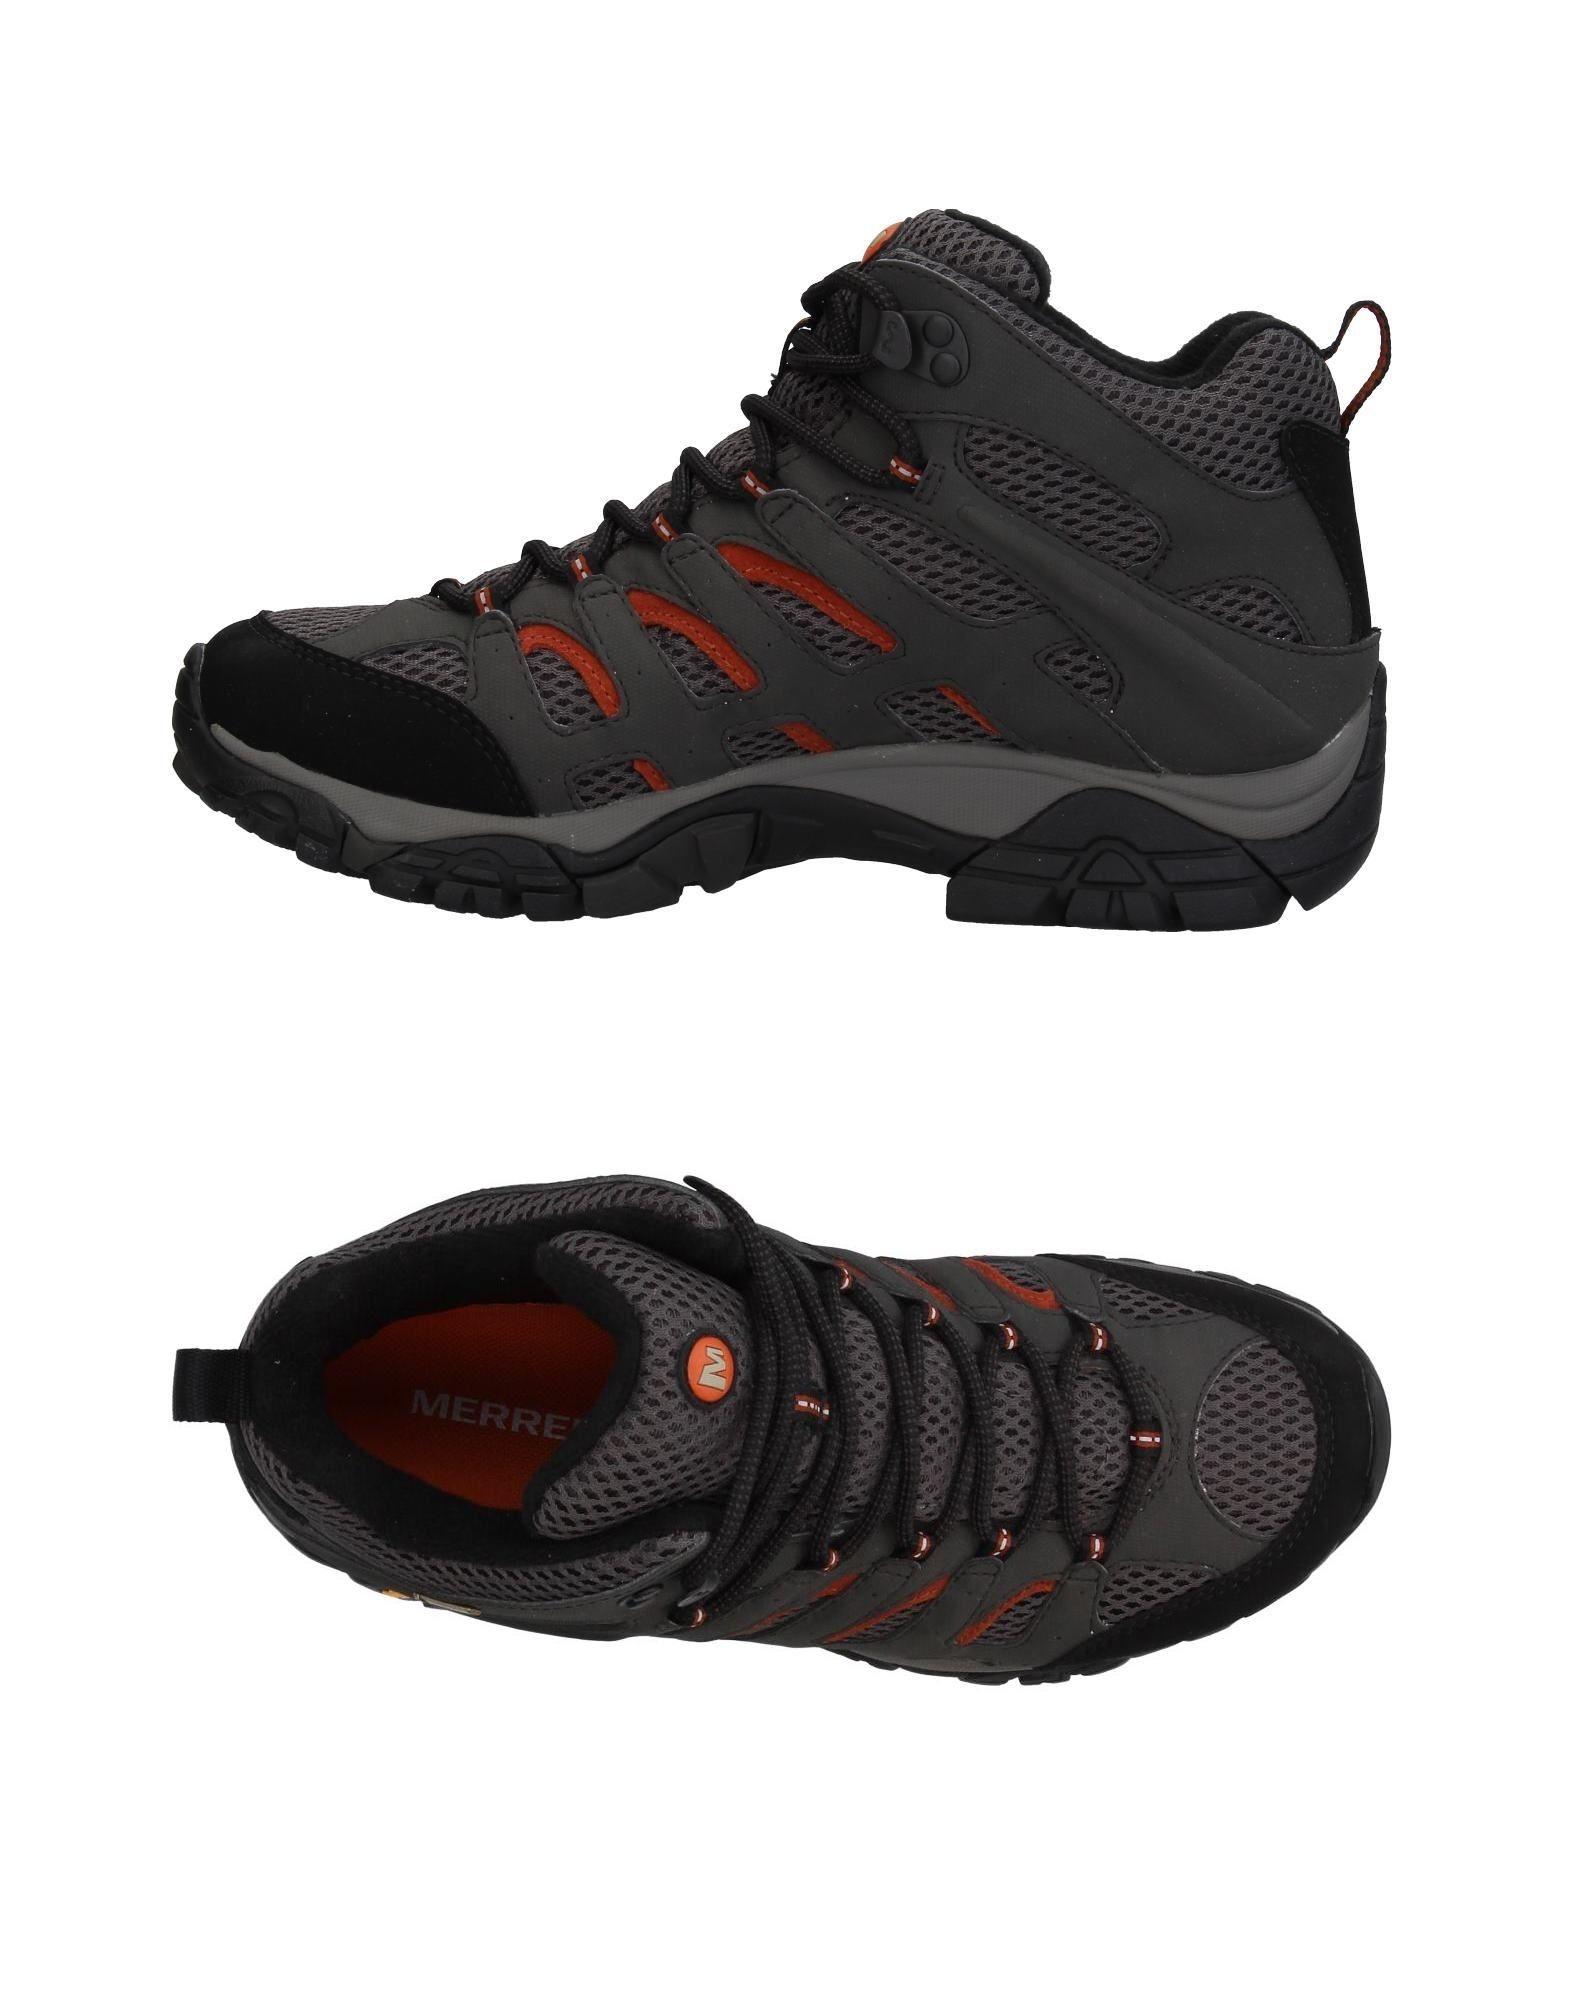 MERRELL Высокие кеды и кроссовки кеды кроссовки высокие dc council mid tx stone camo